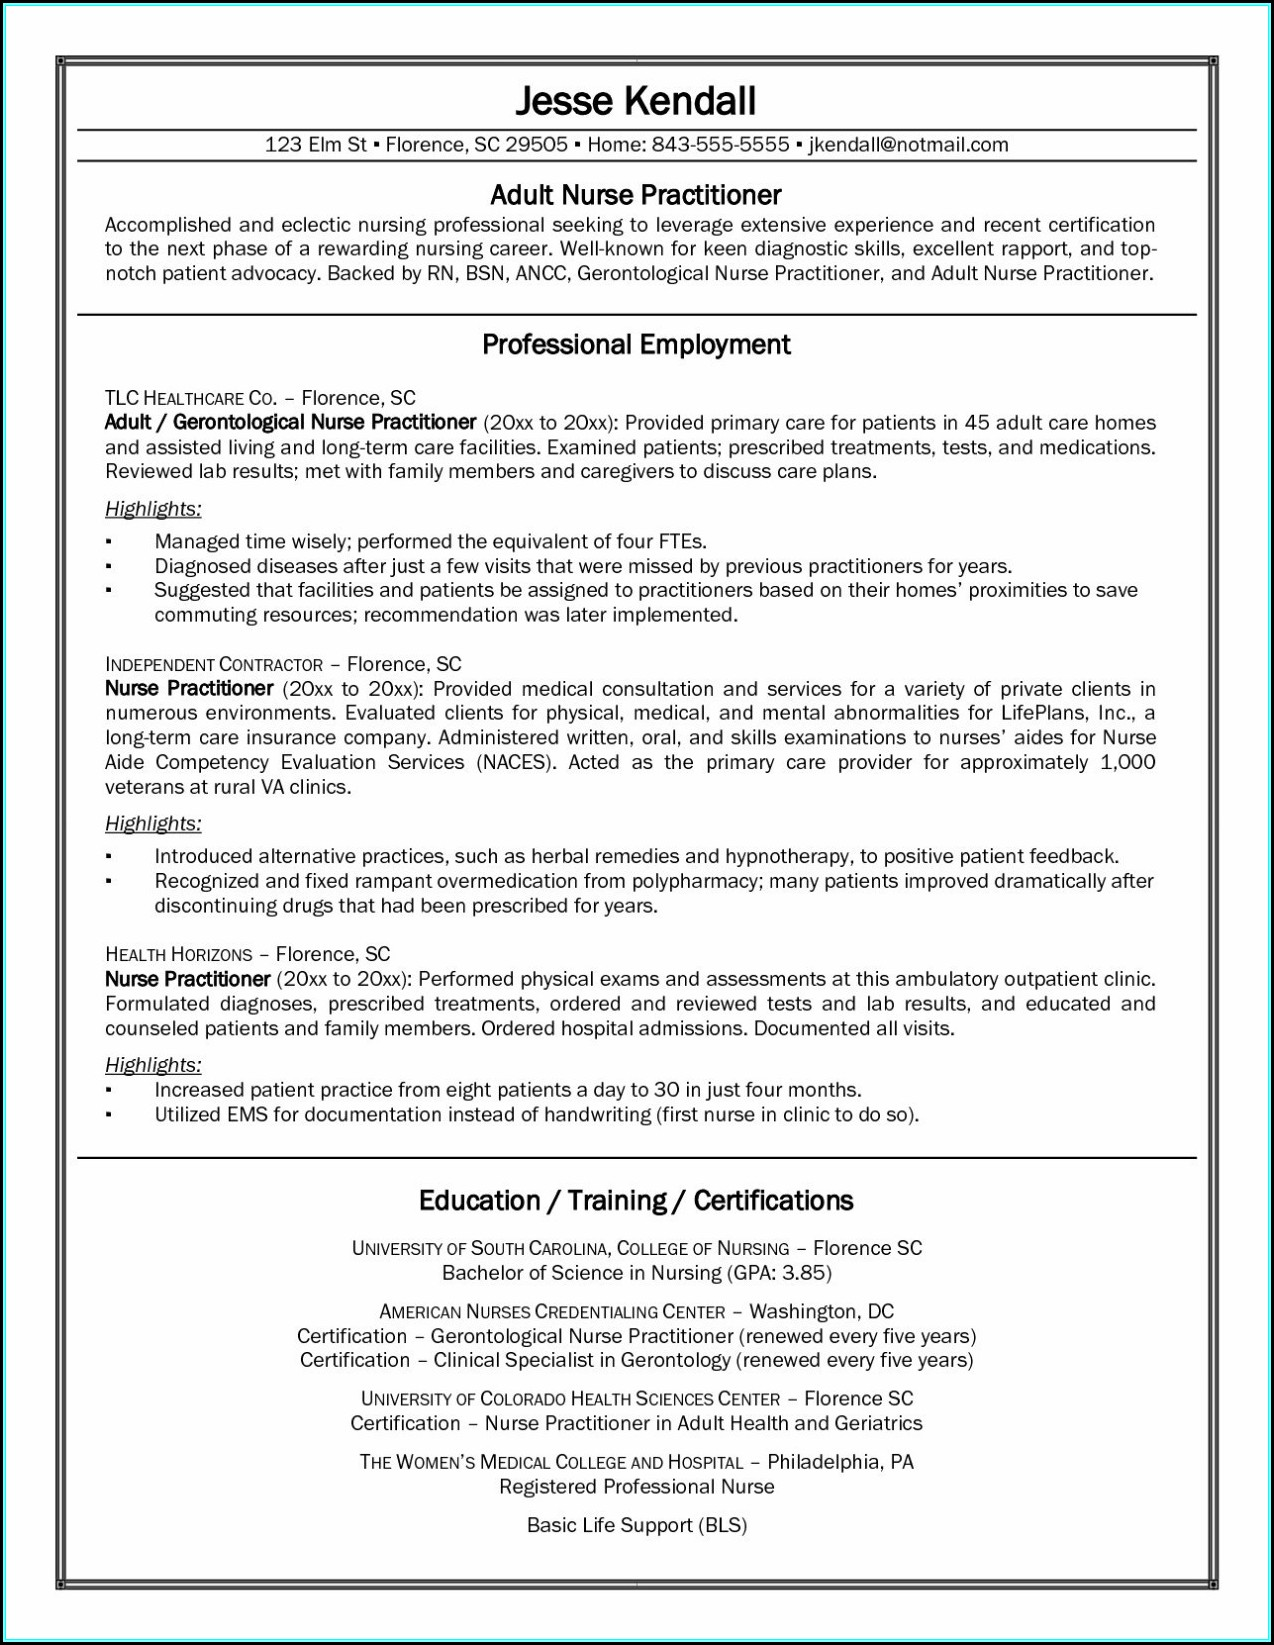 Resume Template For A Registered Nurse